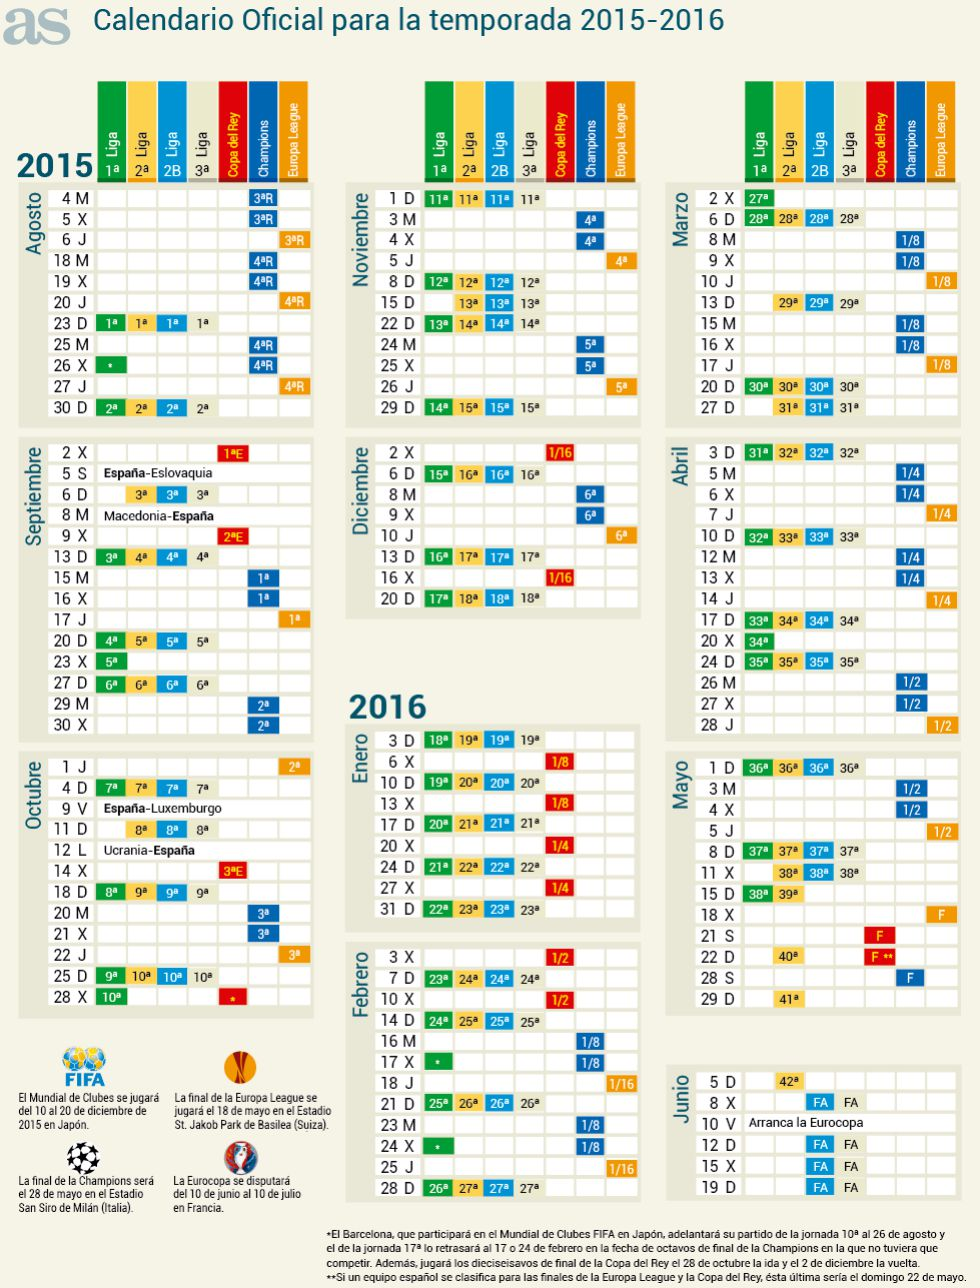 Futbol Calendario.Calendario Oficial De La Temporada 2015 2016 As Com